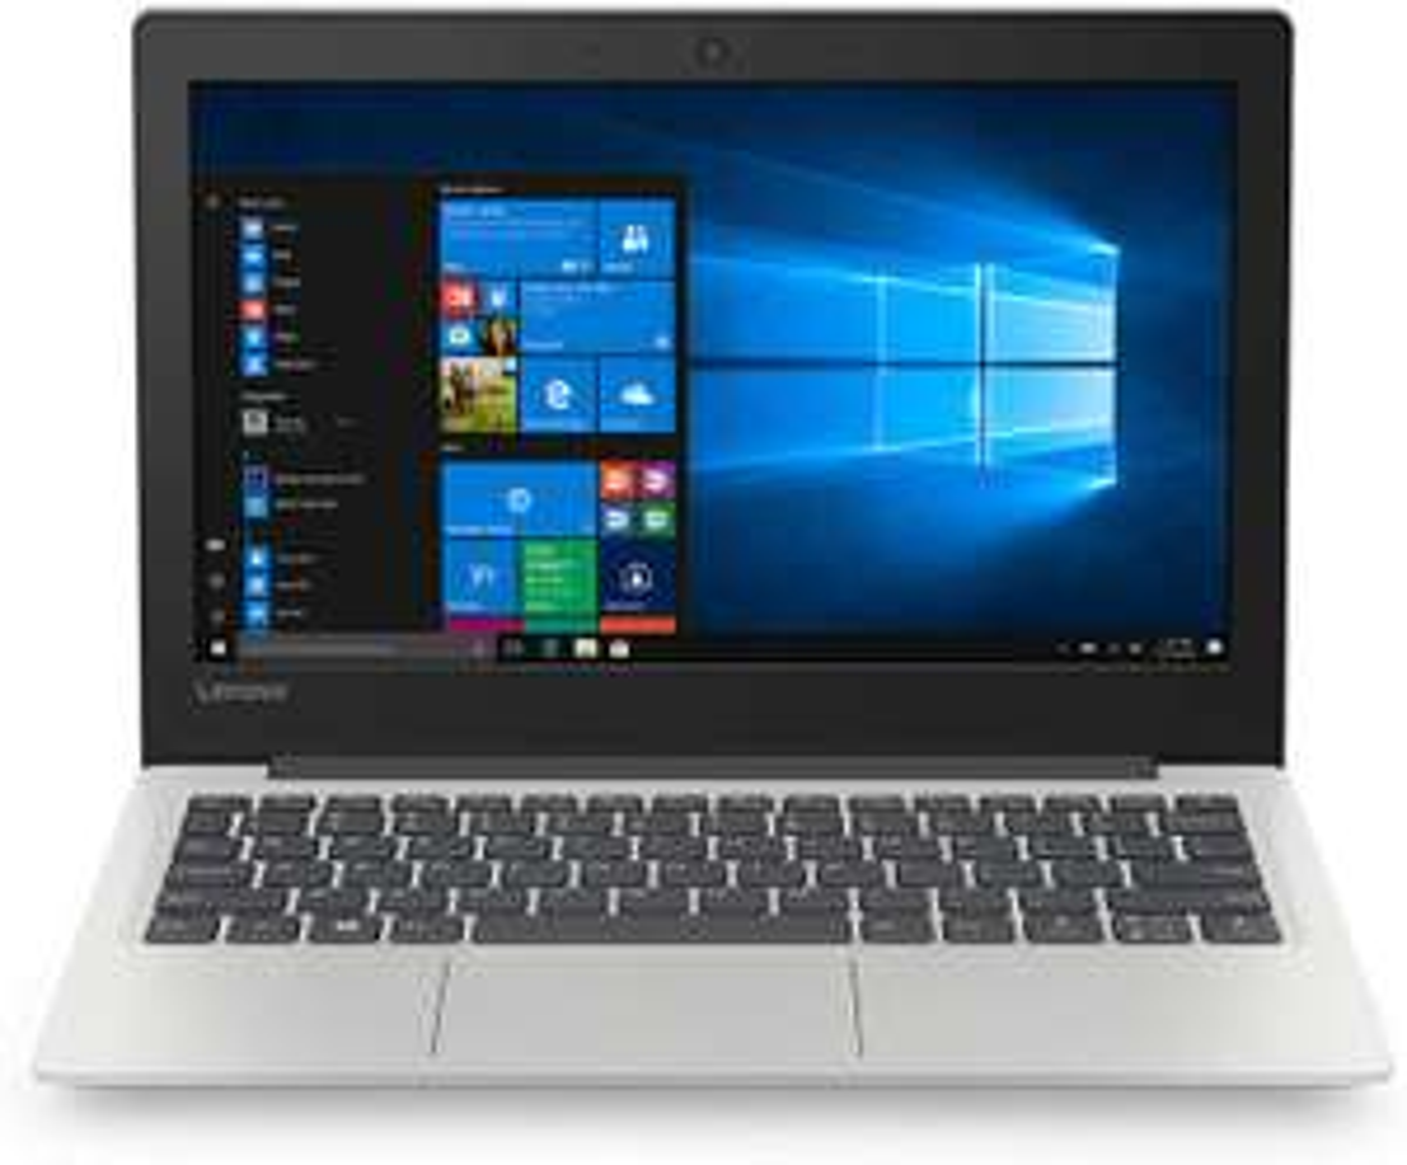 "Lenovo Ideapad S130-11IGM 11.6"" Laptop Intel Celeron N4000, 4GB RAM, 64GB eMMC, Windows 10 S Office 365 Personal- £119.99 delivered @ Amazon"